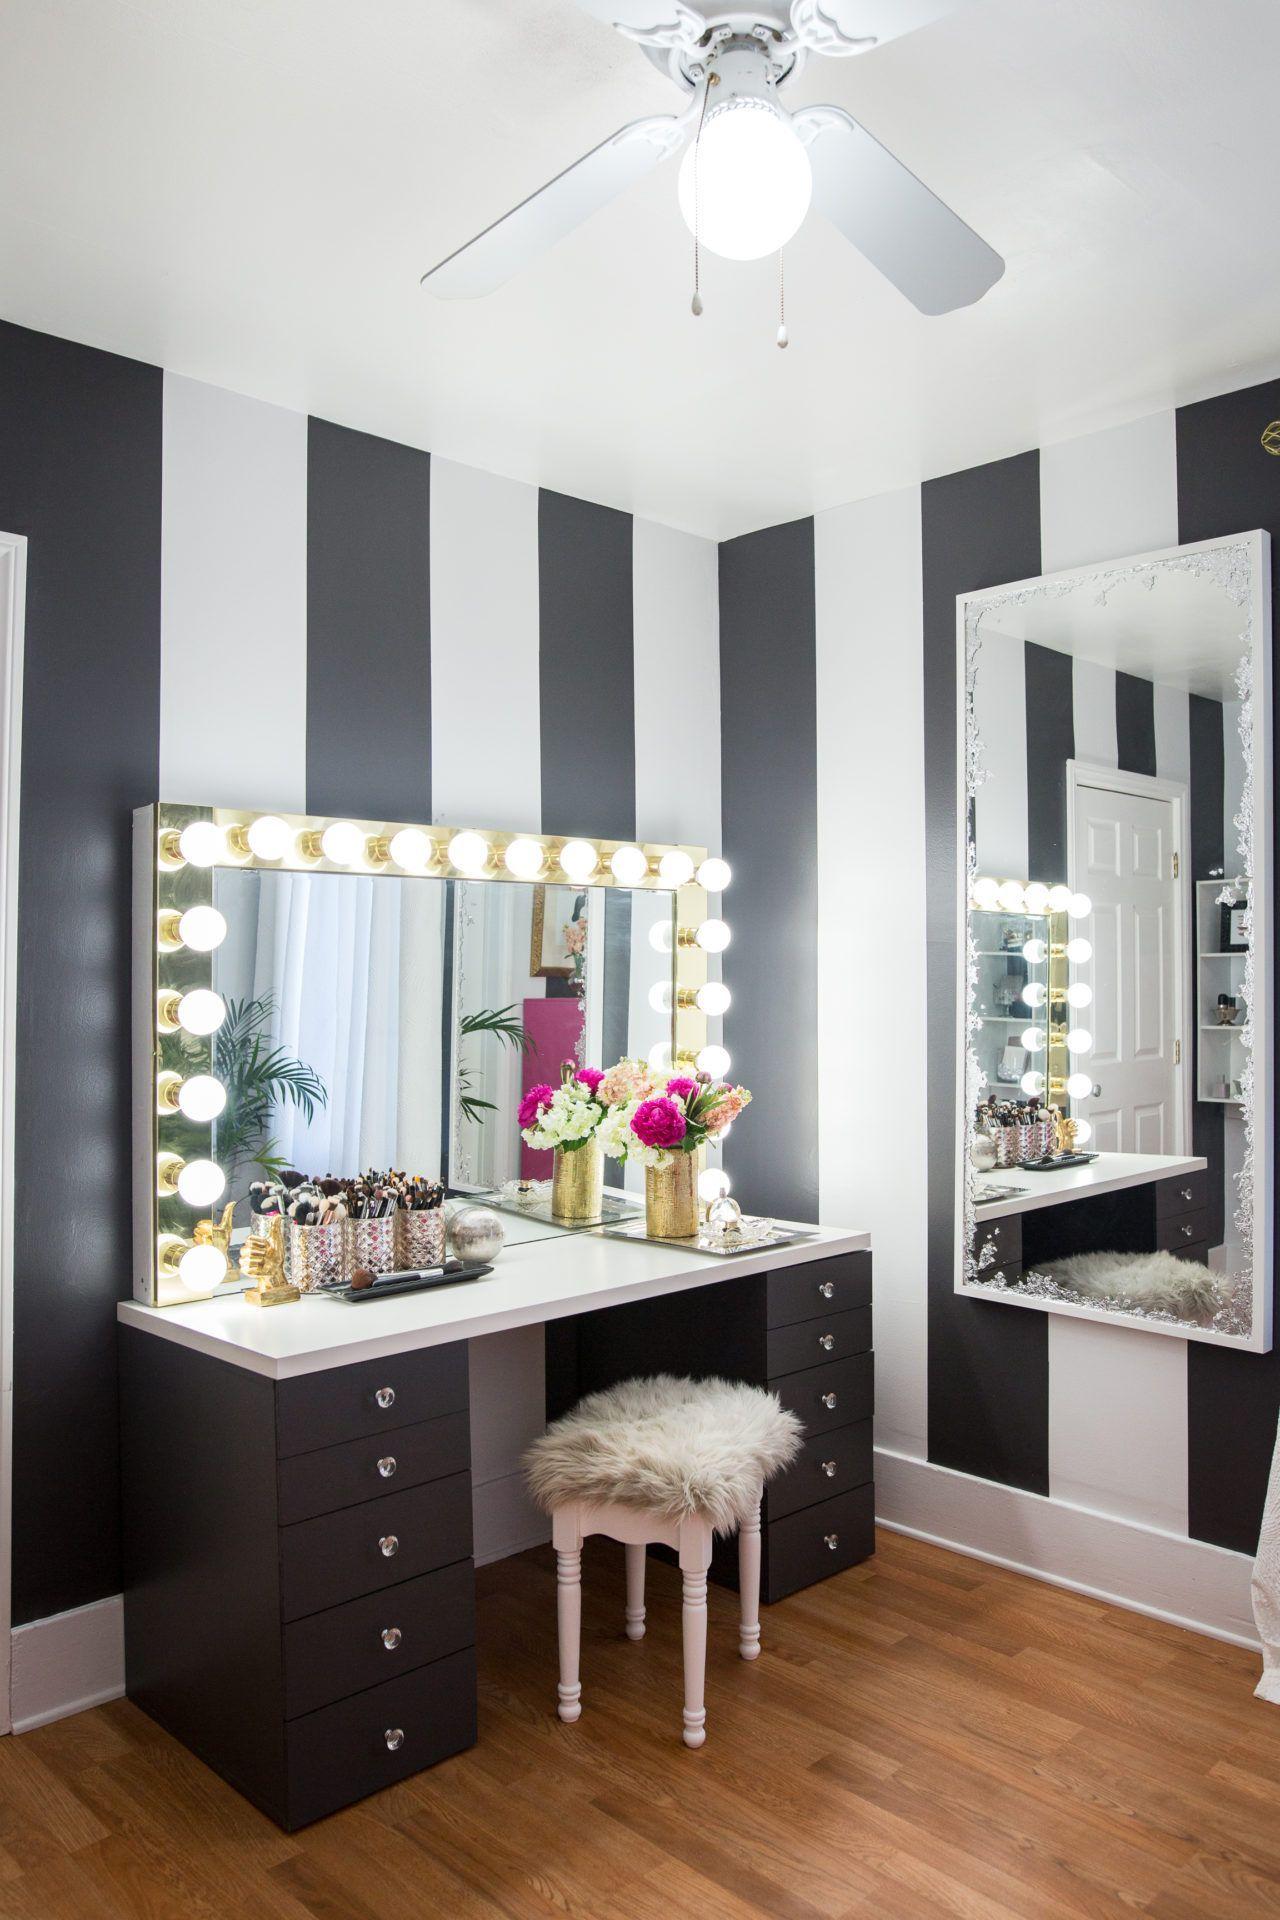 Mr. Kate Under 300 Glam Room Makeover Home decor